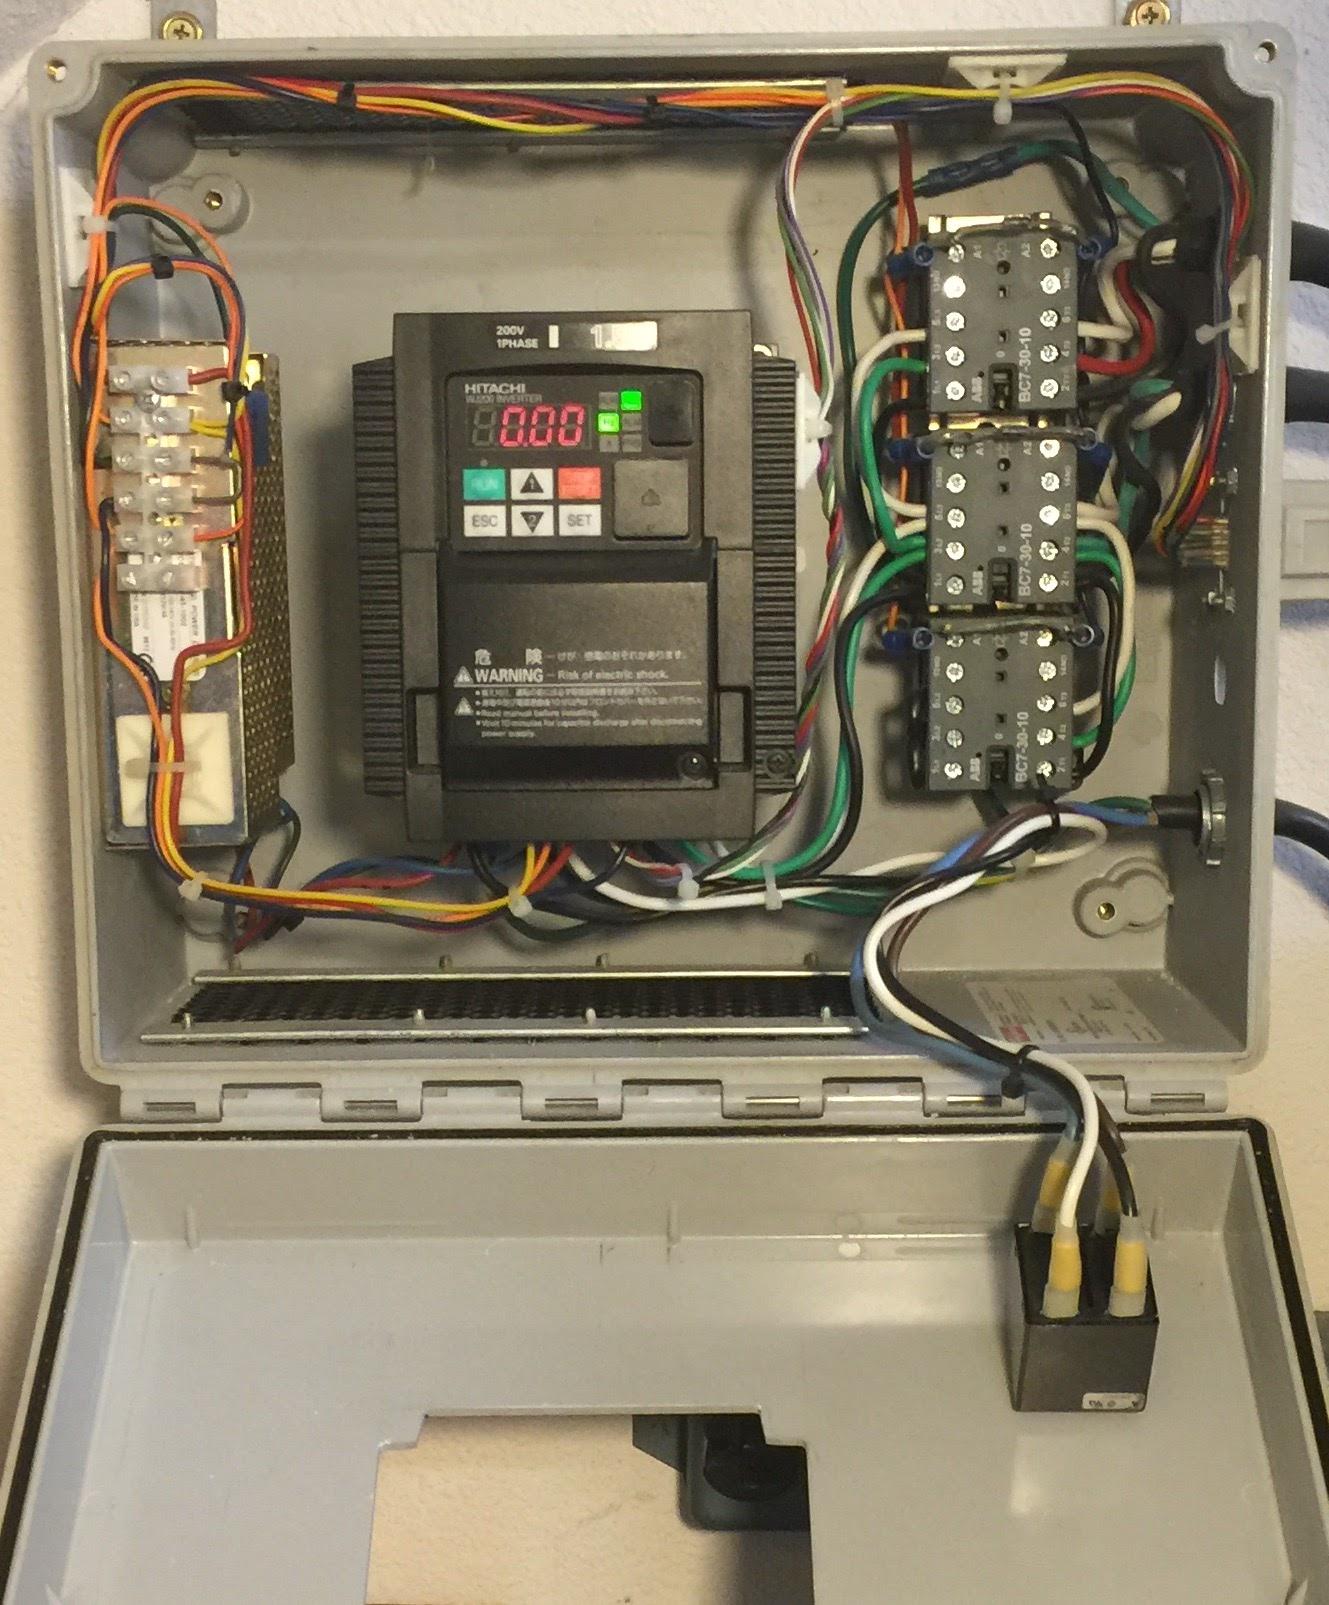 milling machine wiring wiring diagrams page A CNC Machine